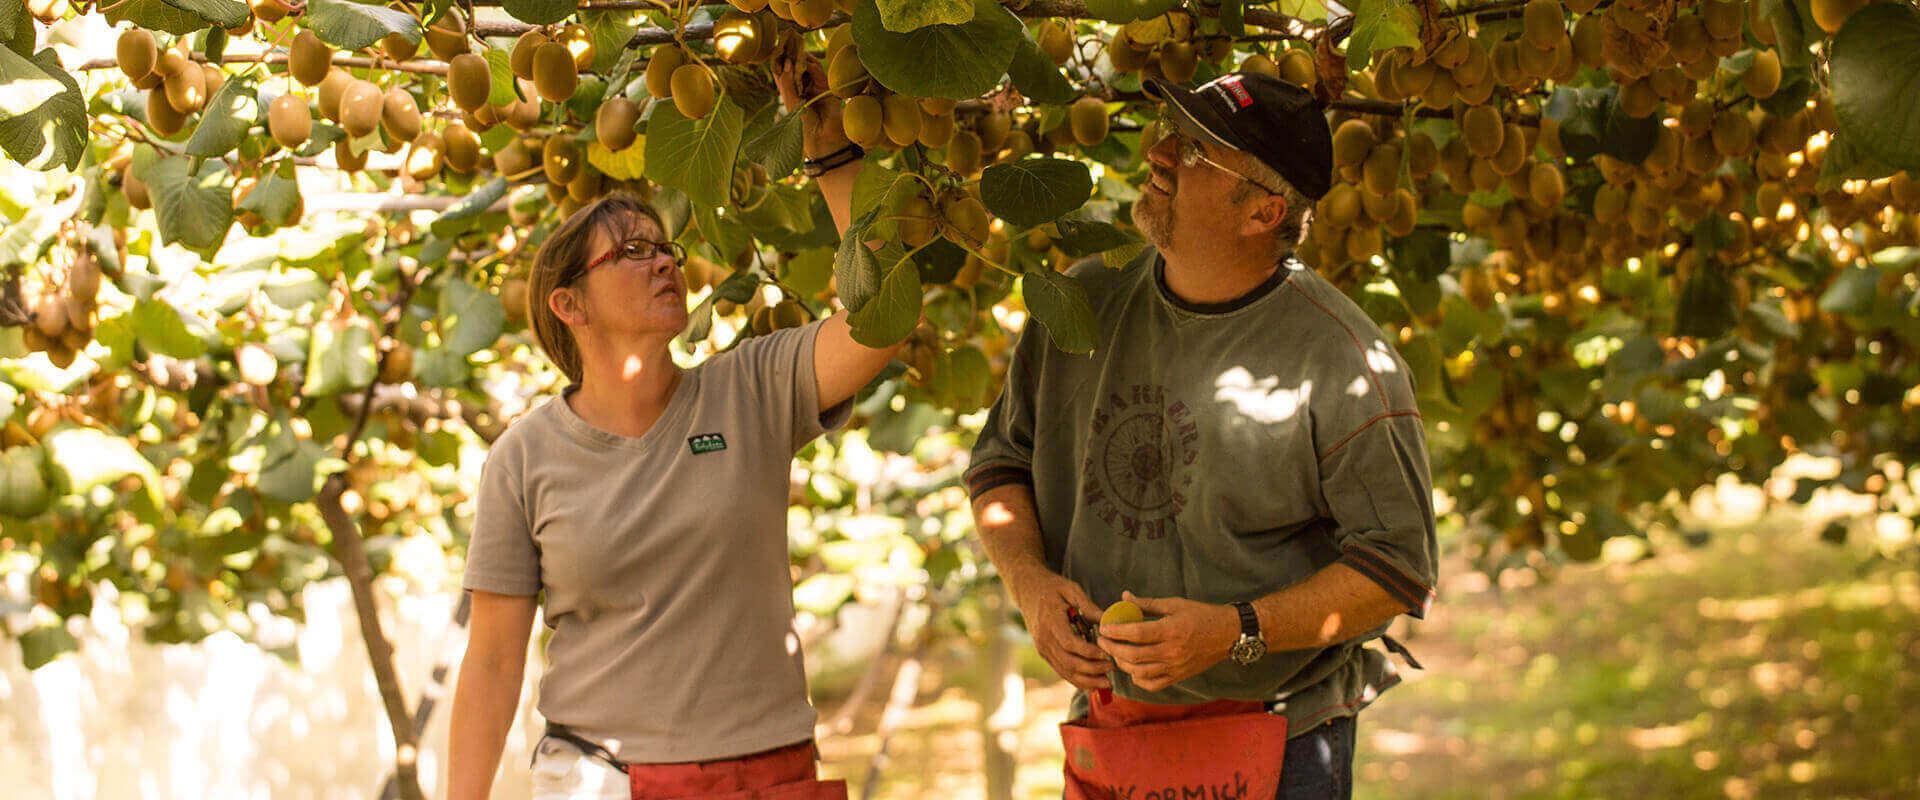 When Is Kiwifruit Season